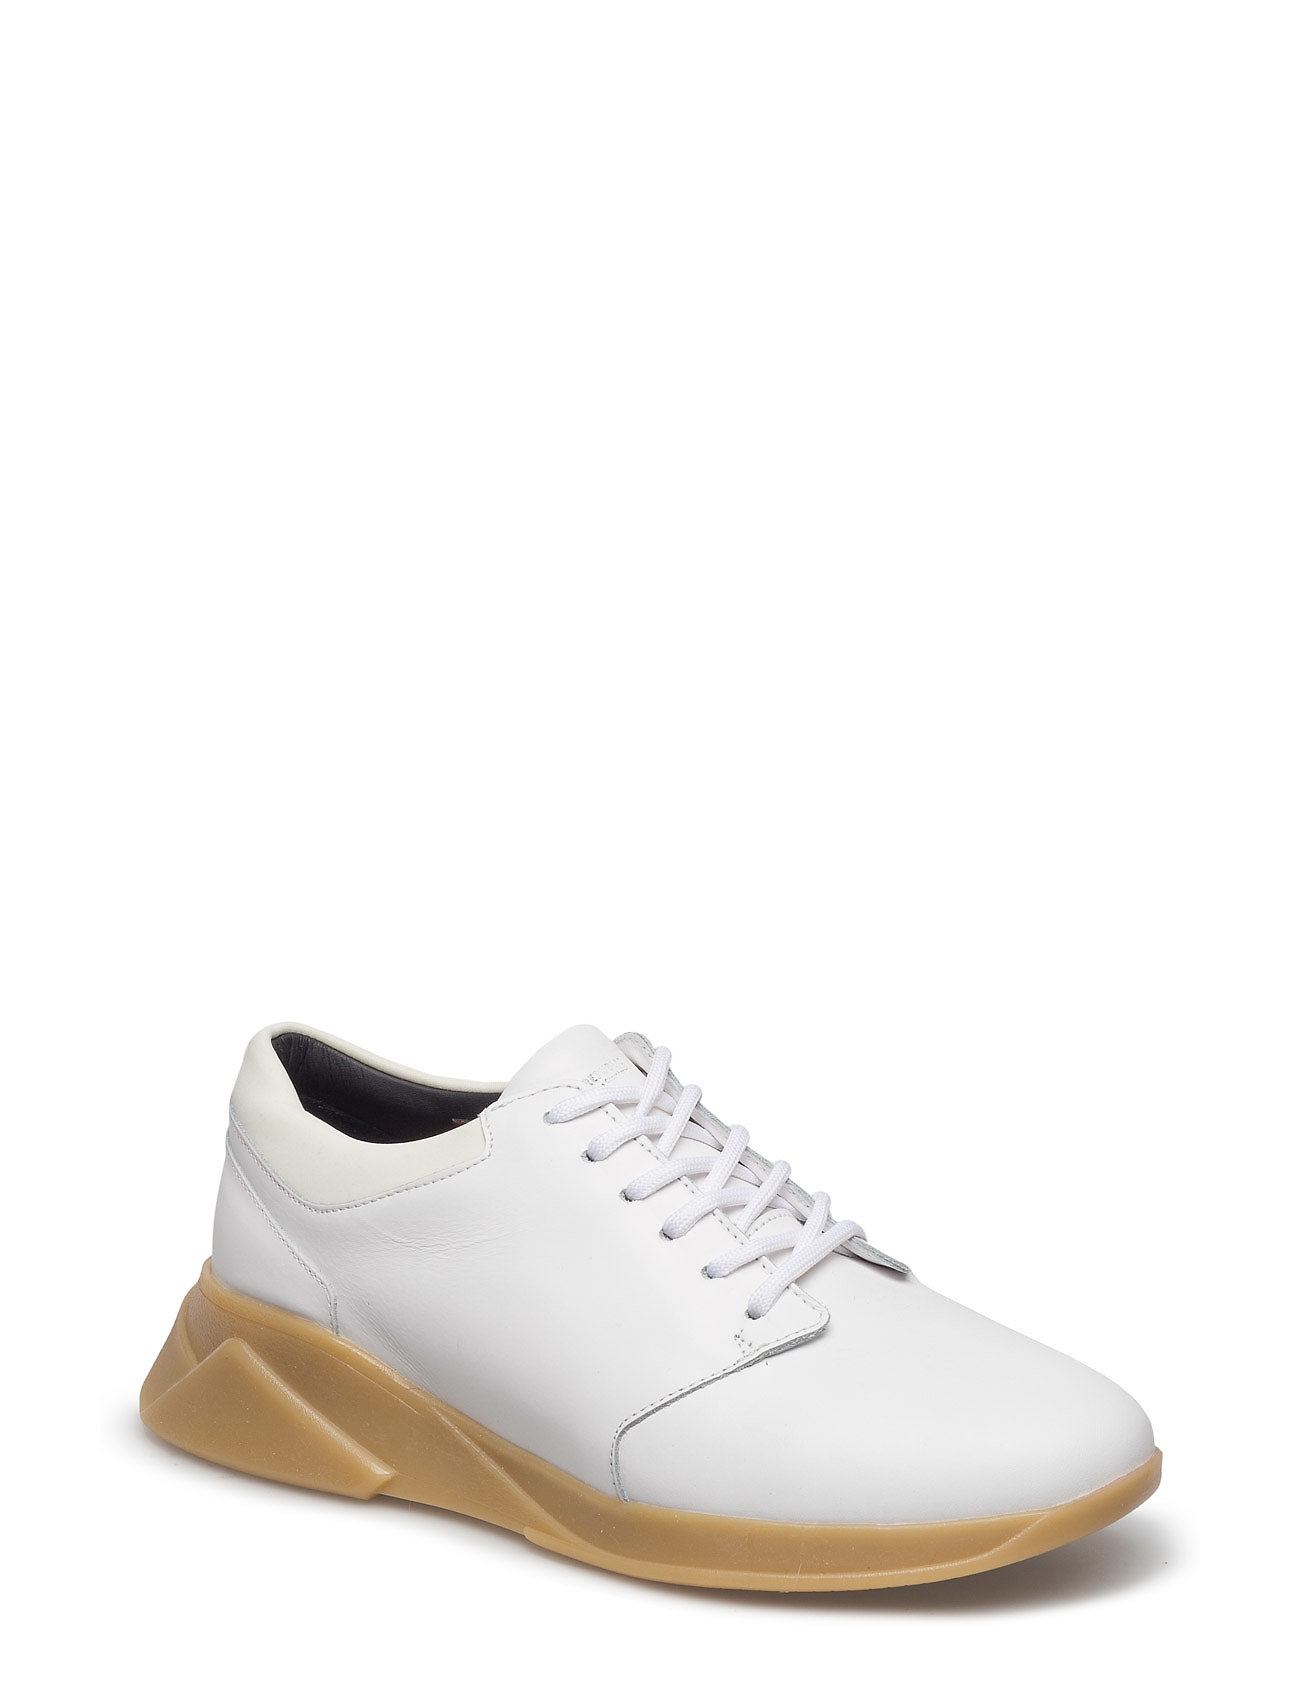 Image of Force Derby Shoe Wmn Low-top Sneakers Hvid Royal RepubliQ (2647084677)